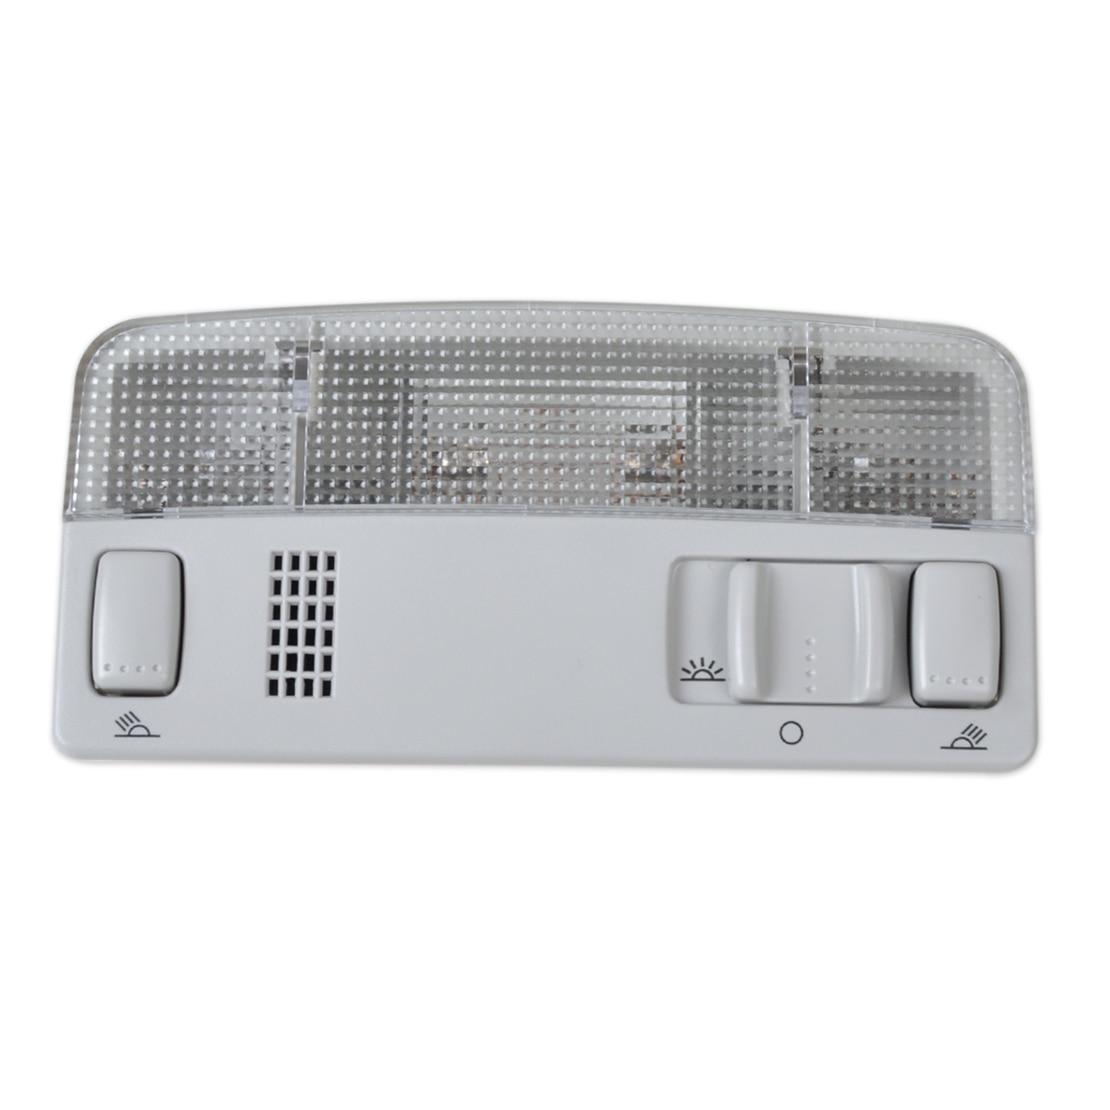 DWCX ITD 947 105 Grey Interior Dome Reading Light Lamp for VW Golf Jetta Bora MK4 Passat B5 1999 2000 2001 2002 2003 2004 cheshunzai interior glove box light storage compartment lamp for vw golf jetta passat b5 bora touran octavia 1j0 947 301